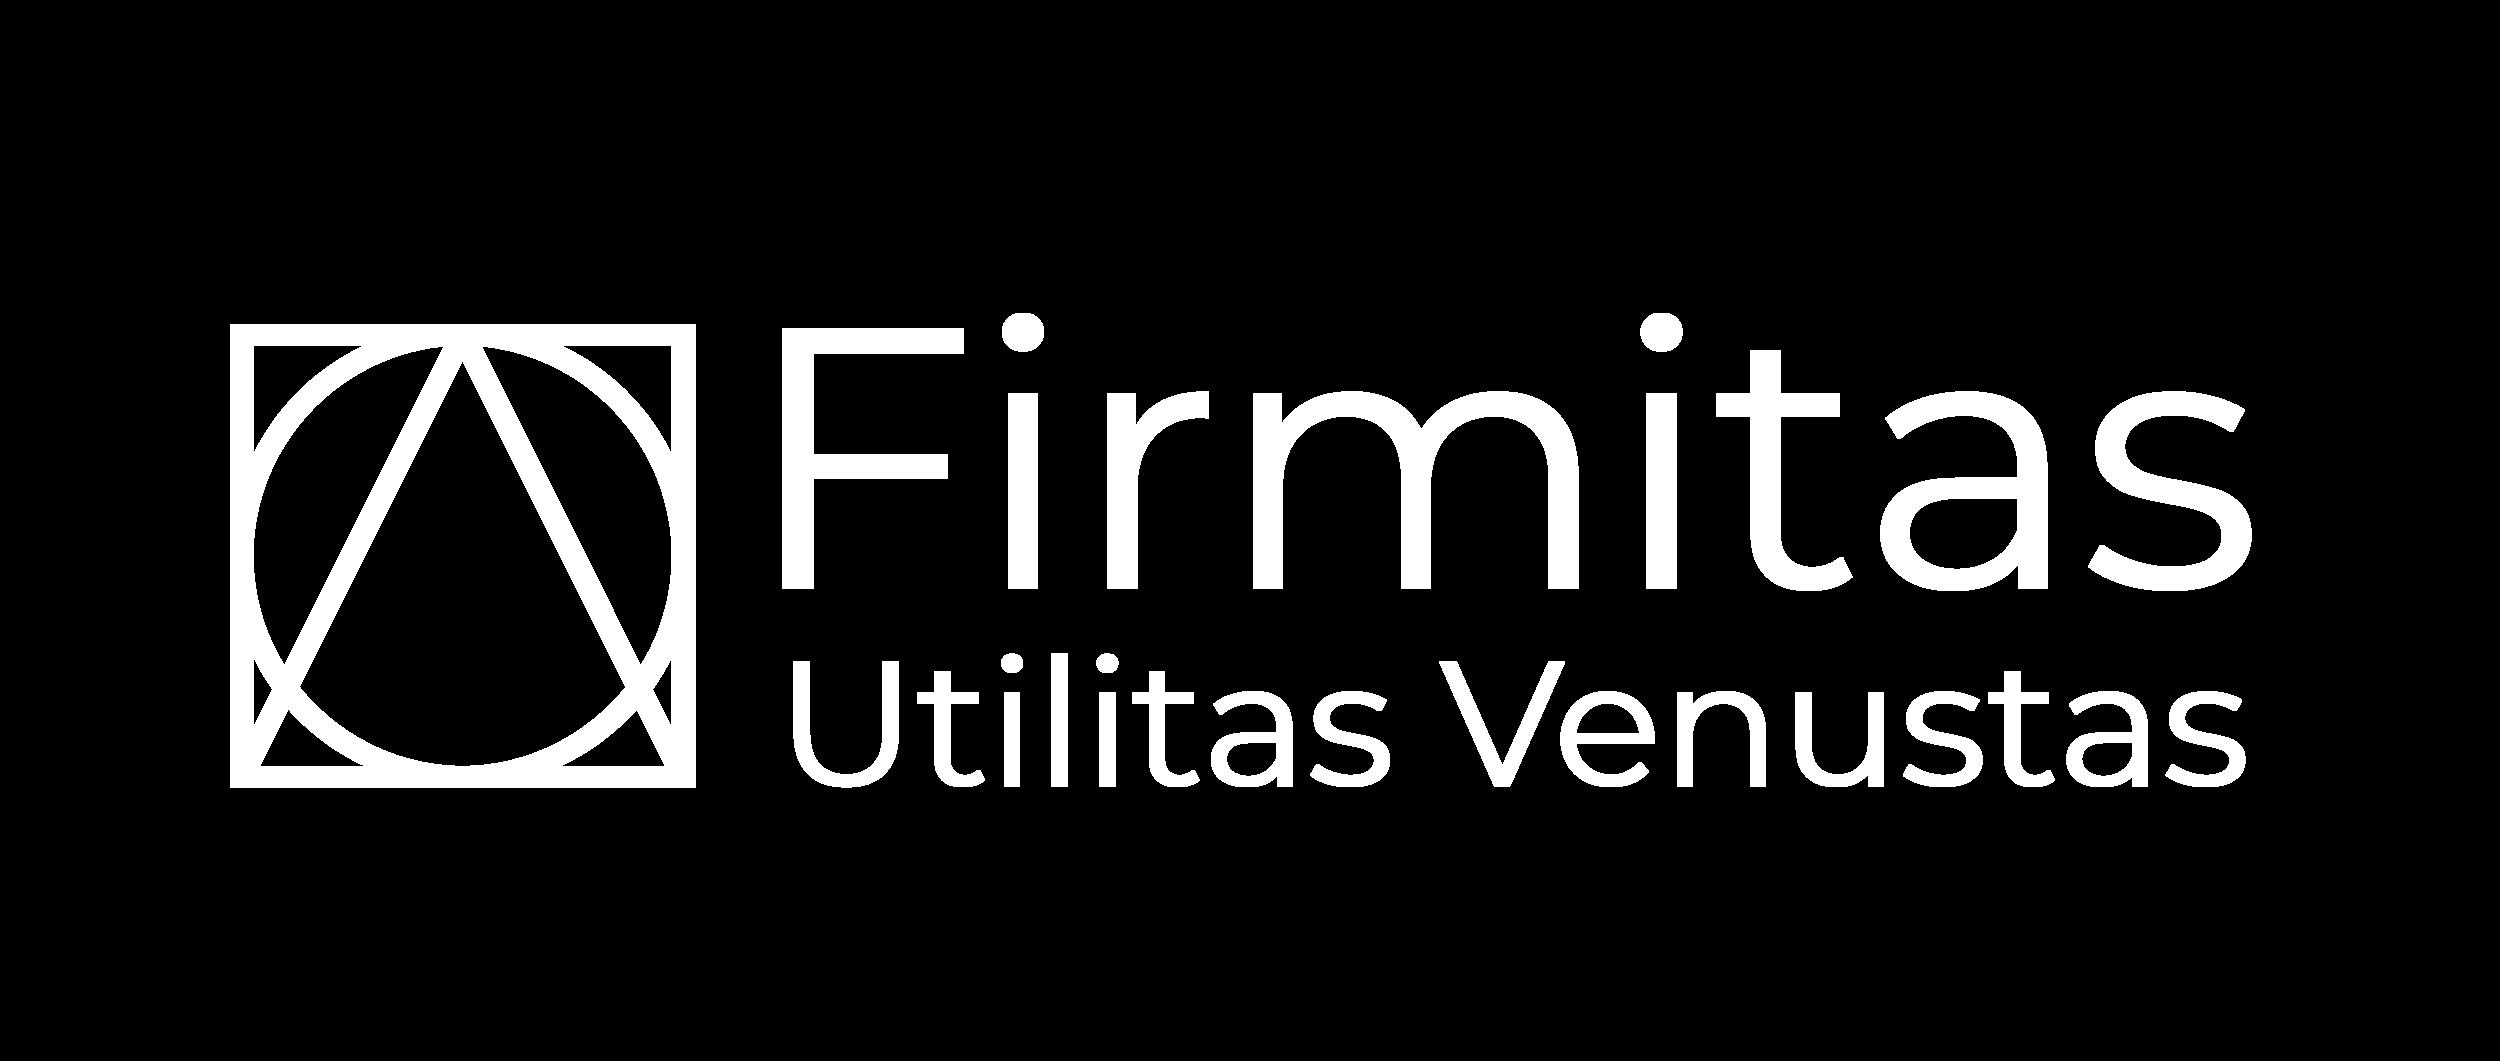 FUV_White logo.png